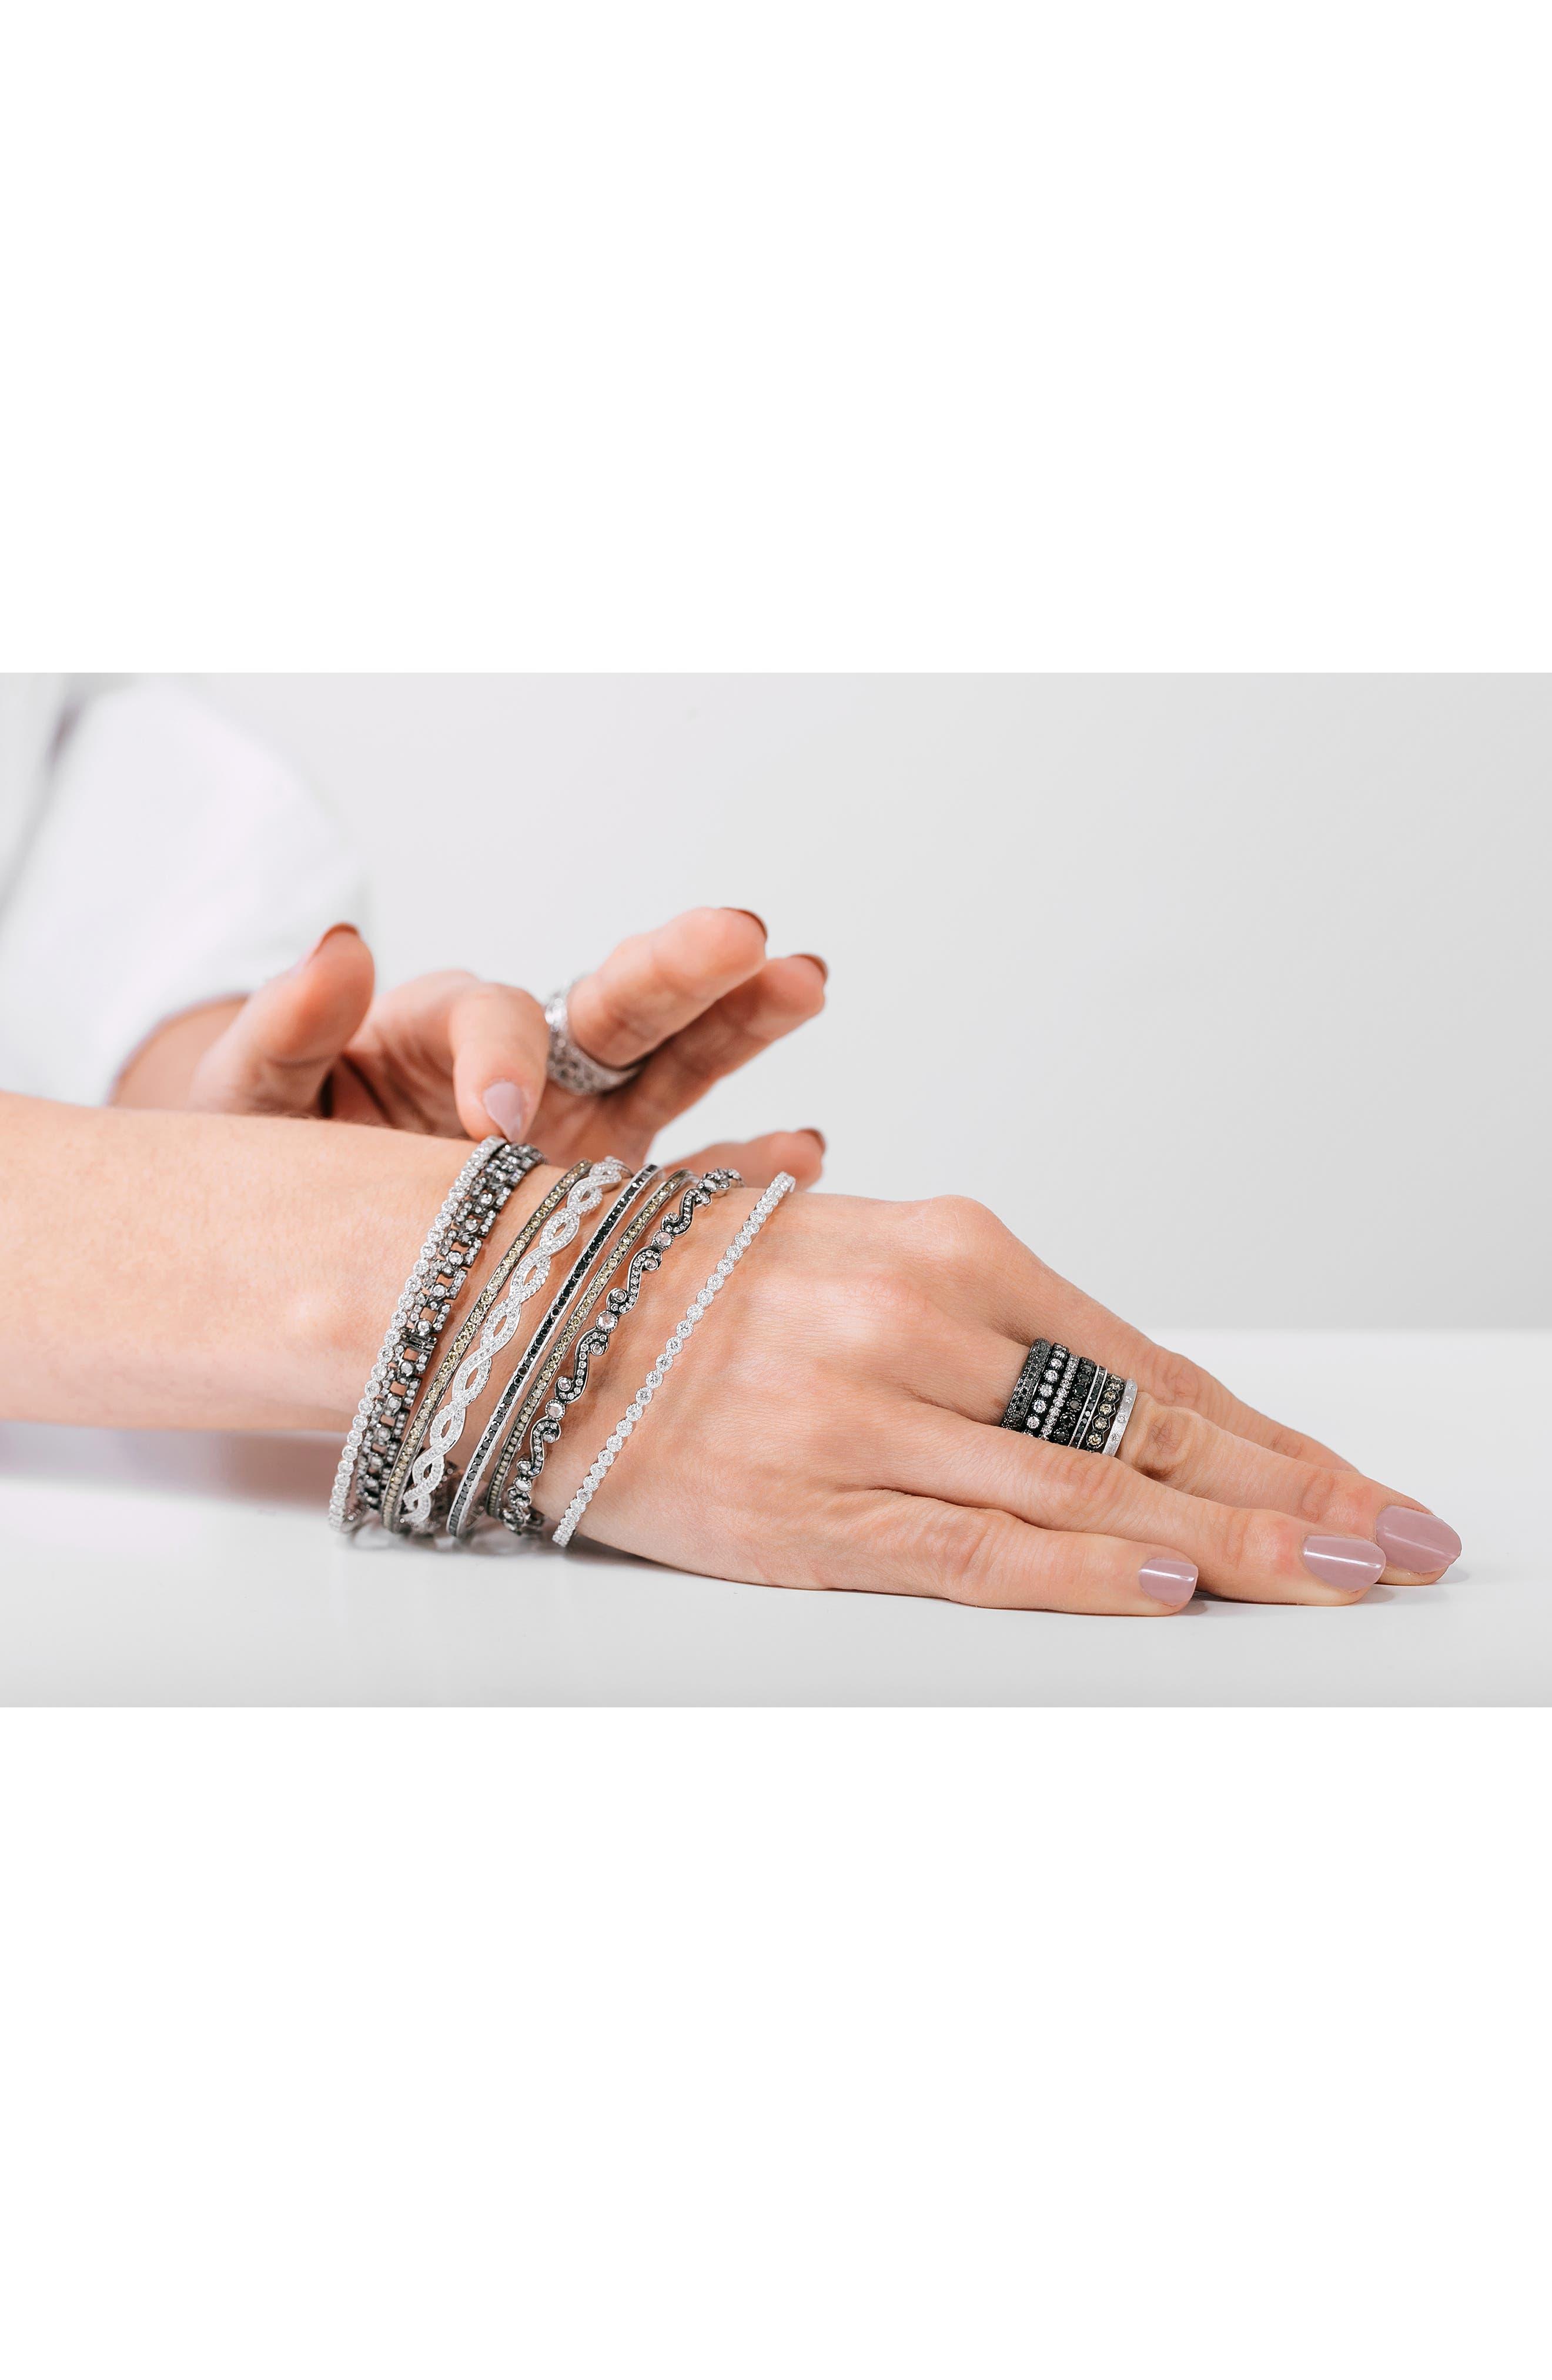 Channel Set Diamond Ring,                             Alternate thumbnail 3, color,                             White Gold/ Black Diamond